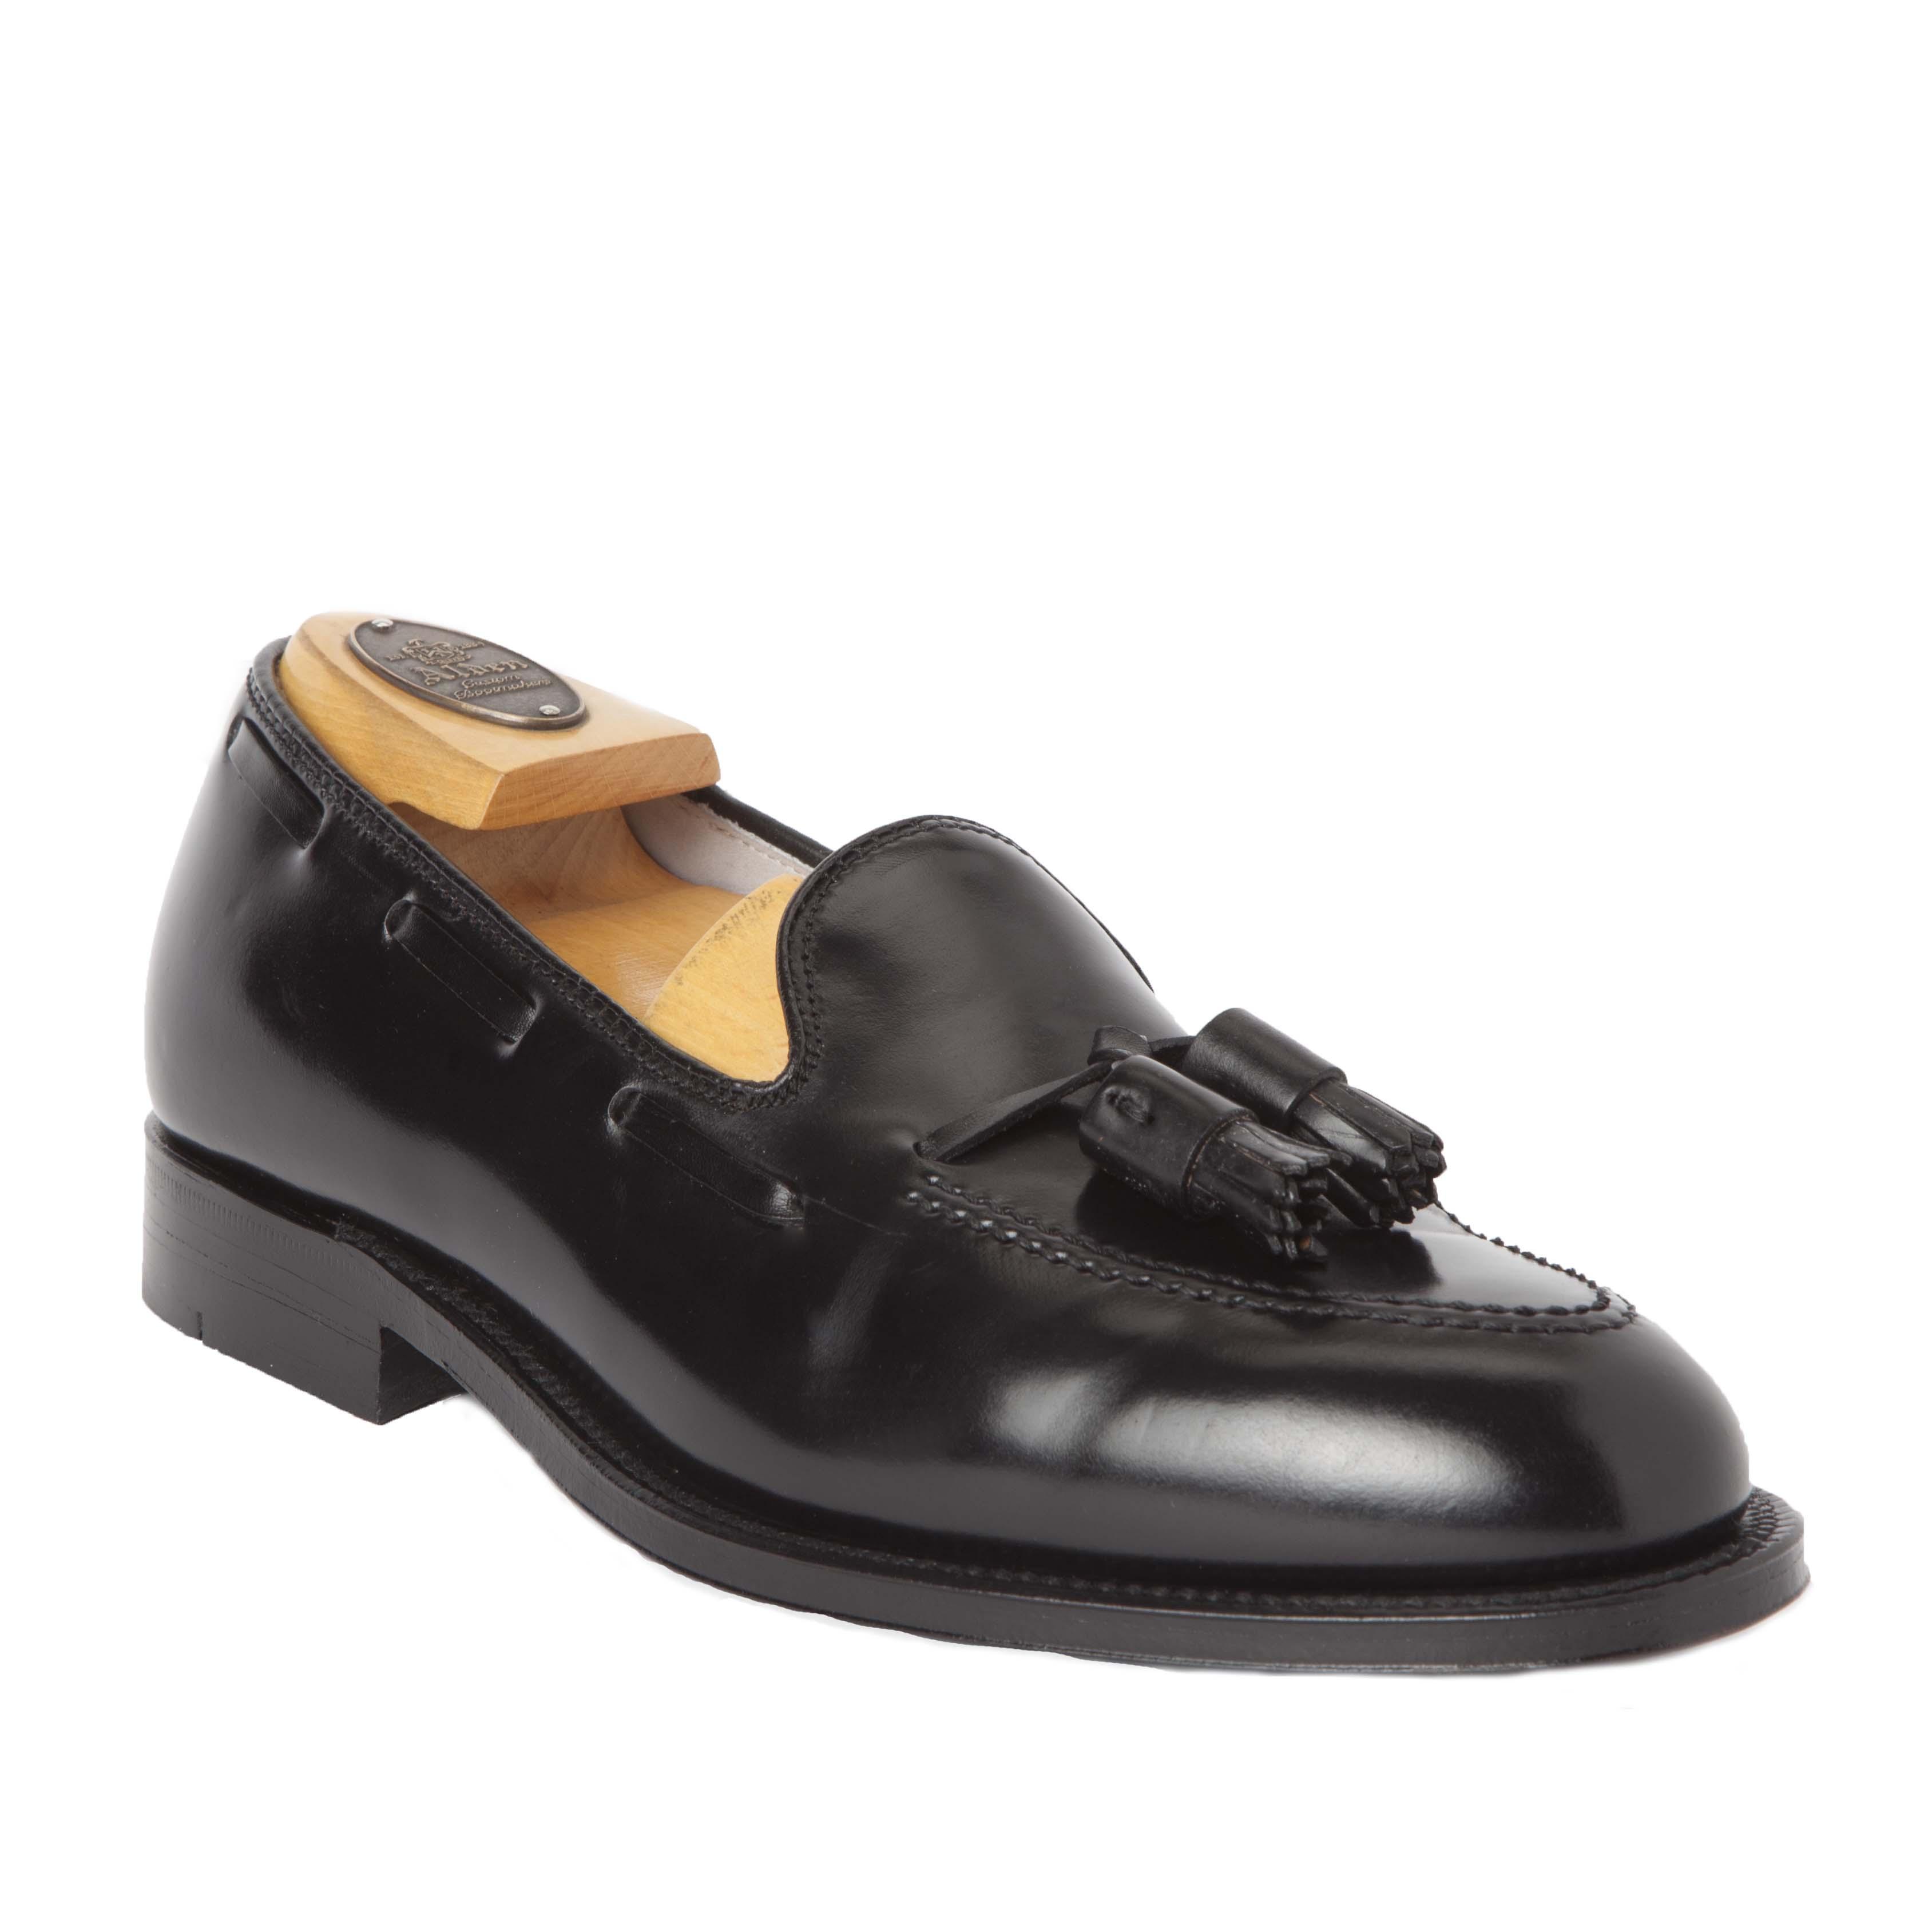 Tassel Loaferblack Shell Cordovan664 Alden Shoes Madison